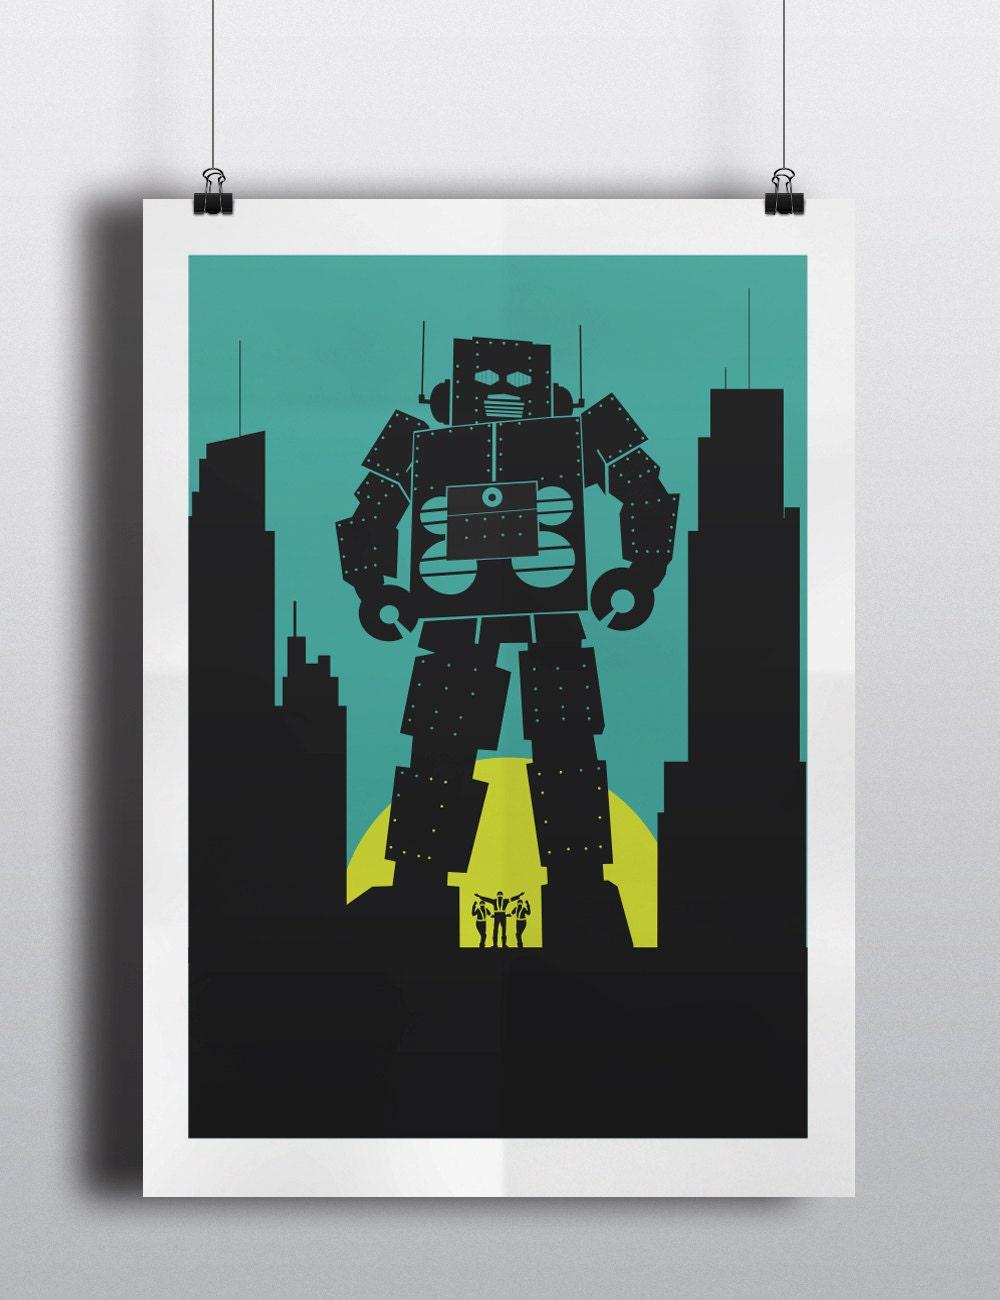 Beastie Boys Intergalactic robot inspired print Tokyo Japan | Etsy